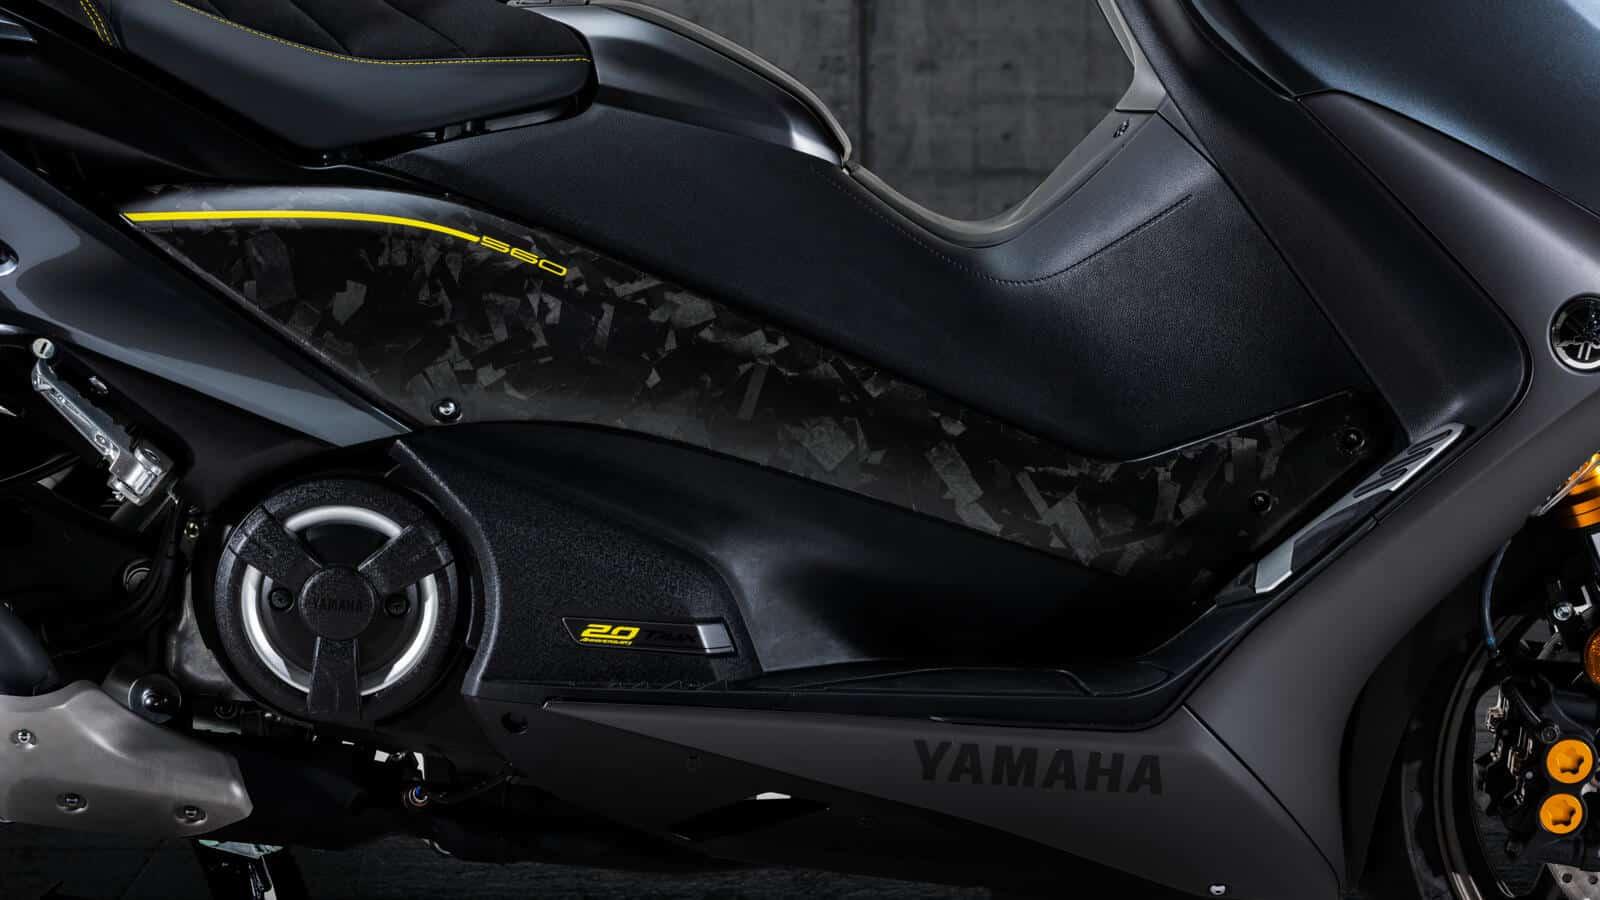 RBW throttle technology